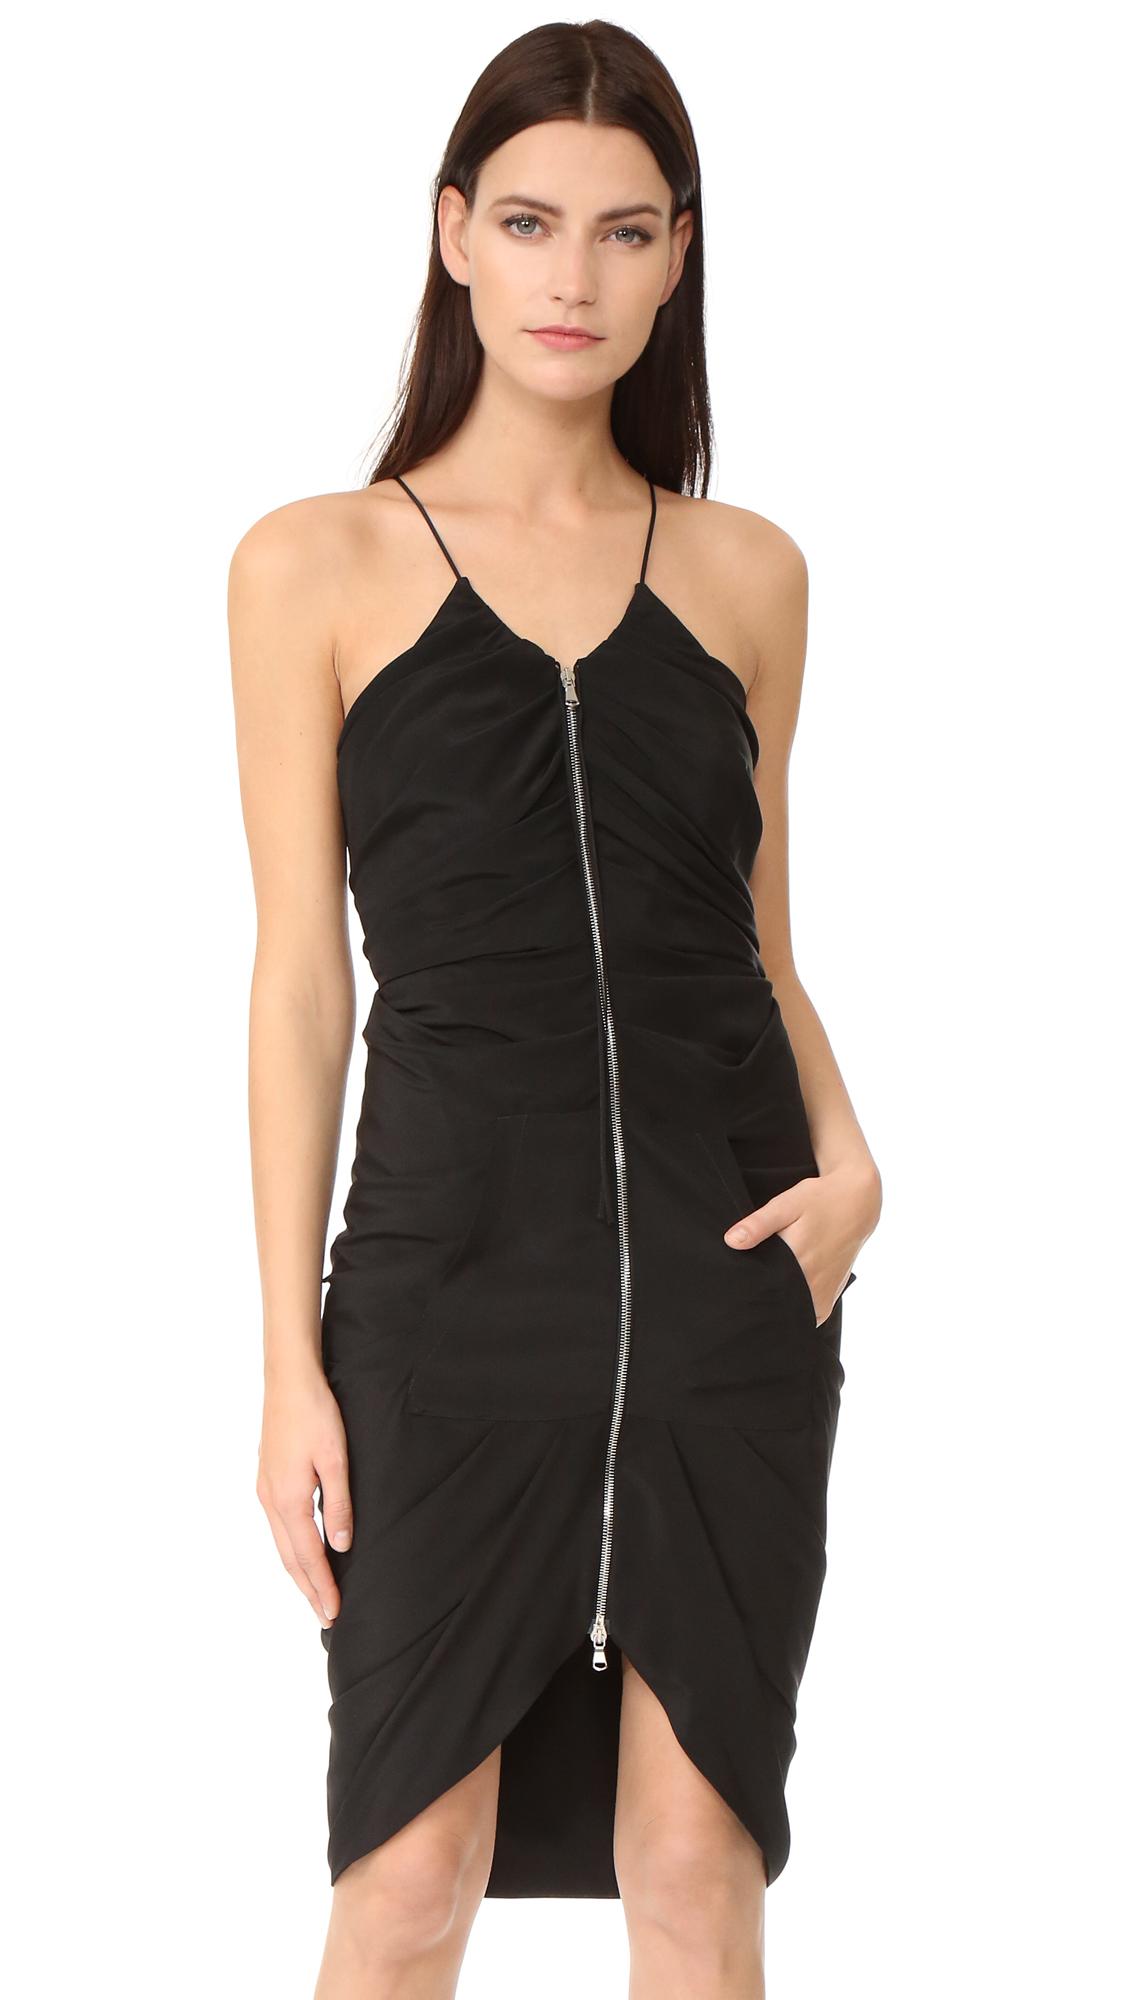 Moschino Zipper Down Dress - Black at Shopbop